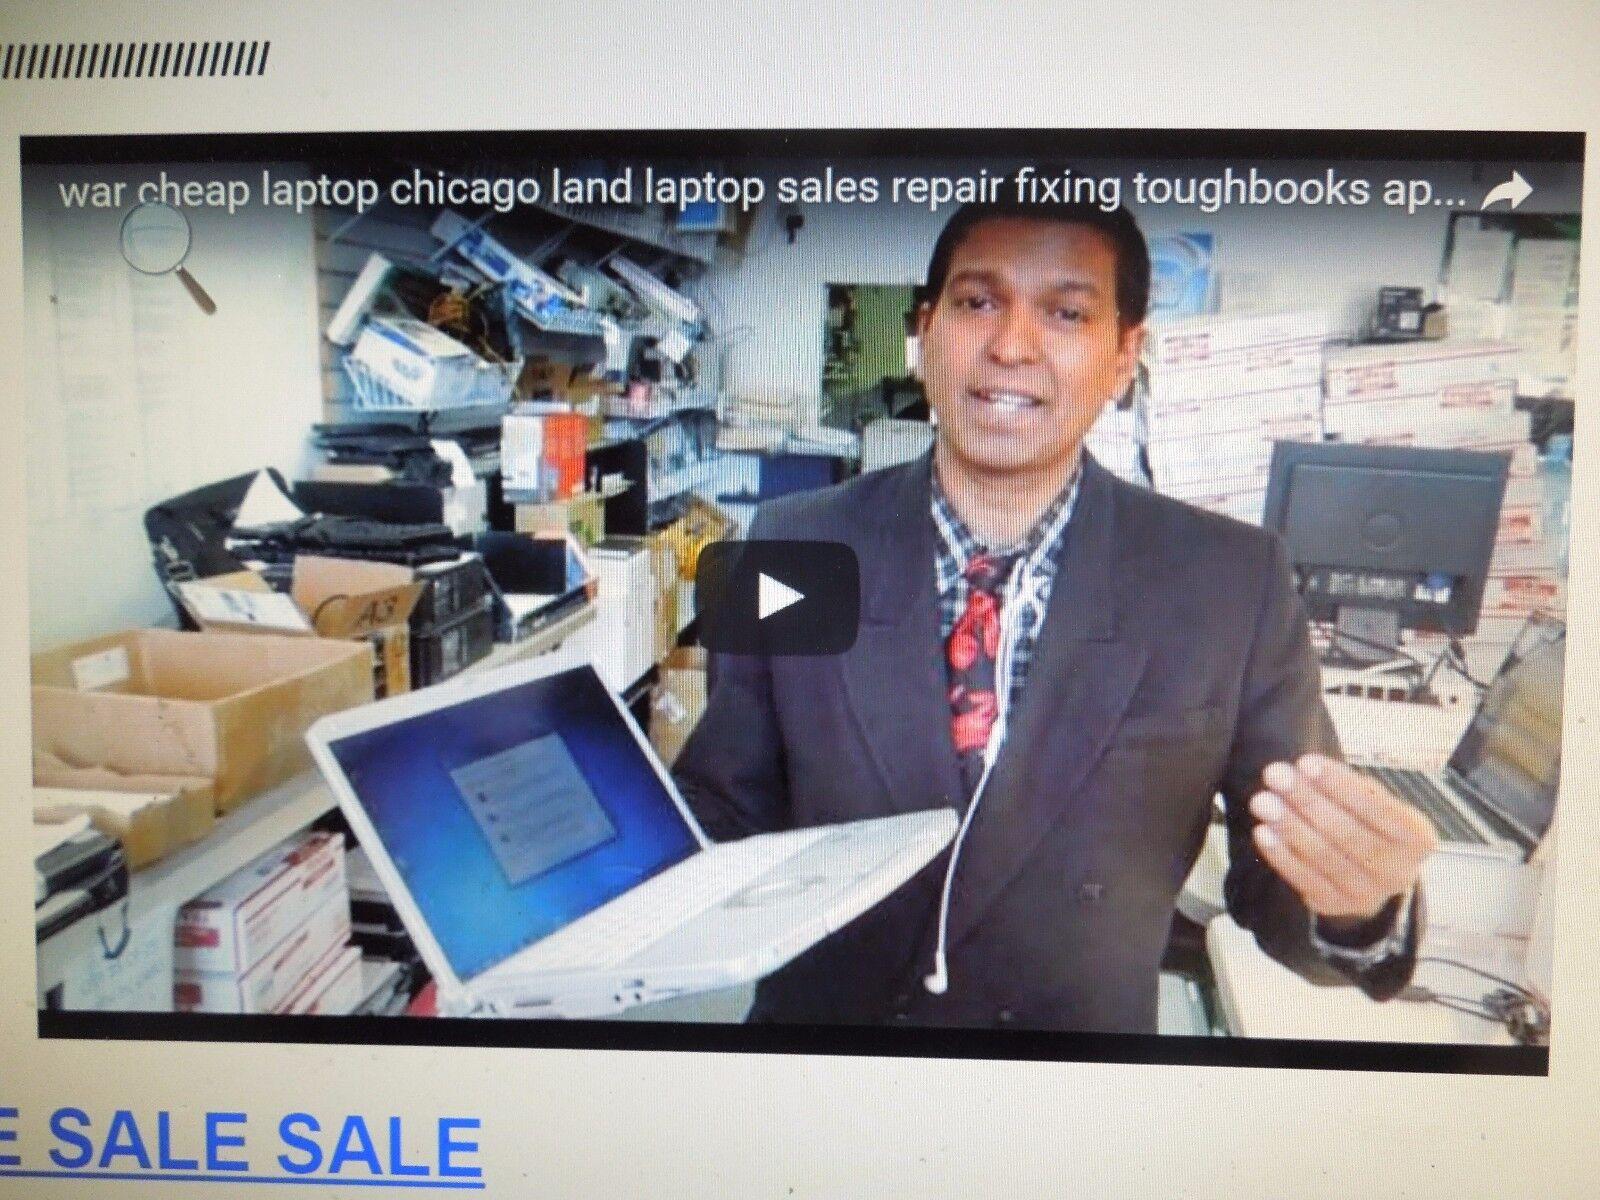 SERIAL PORT/win10/CF-20/Panasonic Toughbook/Rugged/Tablet war cheap Laptop/4gLTE